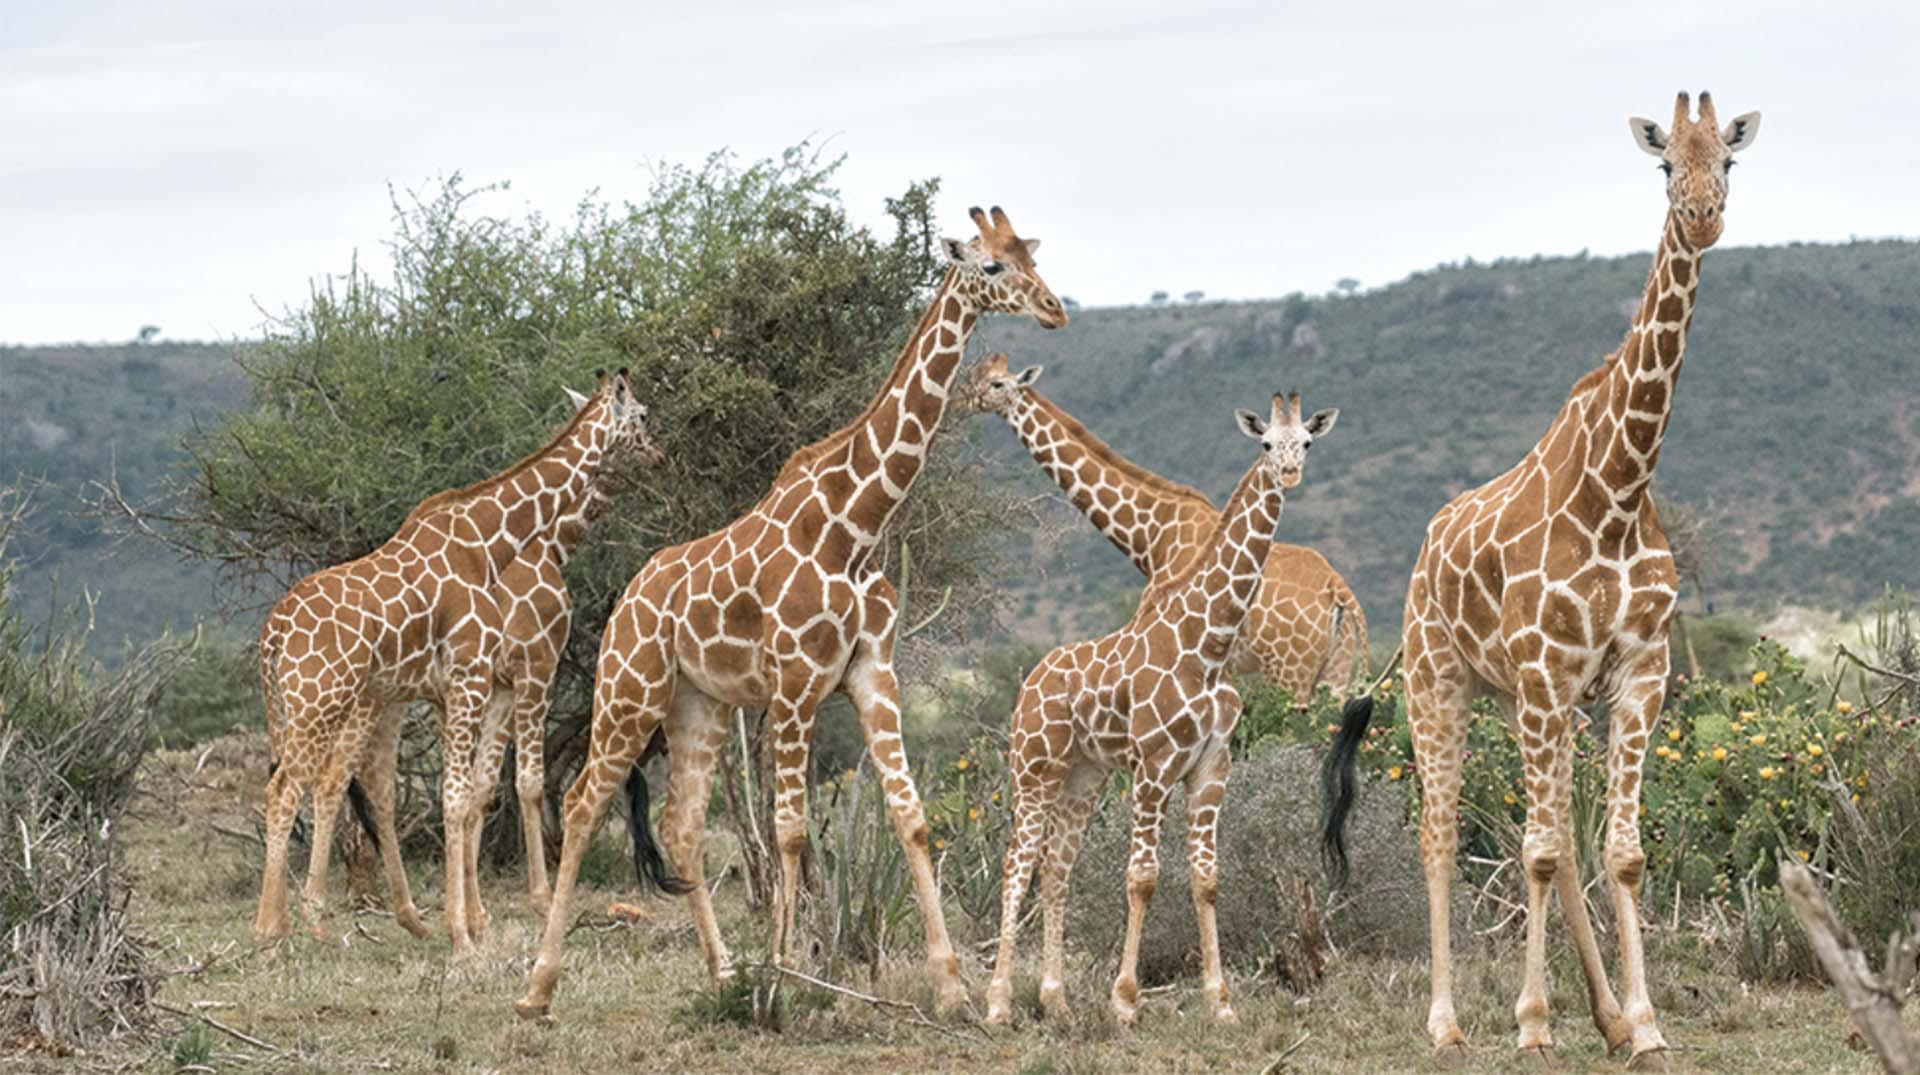 Giraffe San Diego Zoo Animals Plants